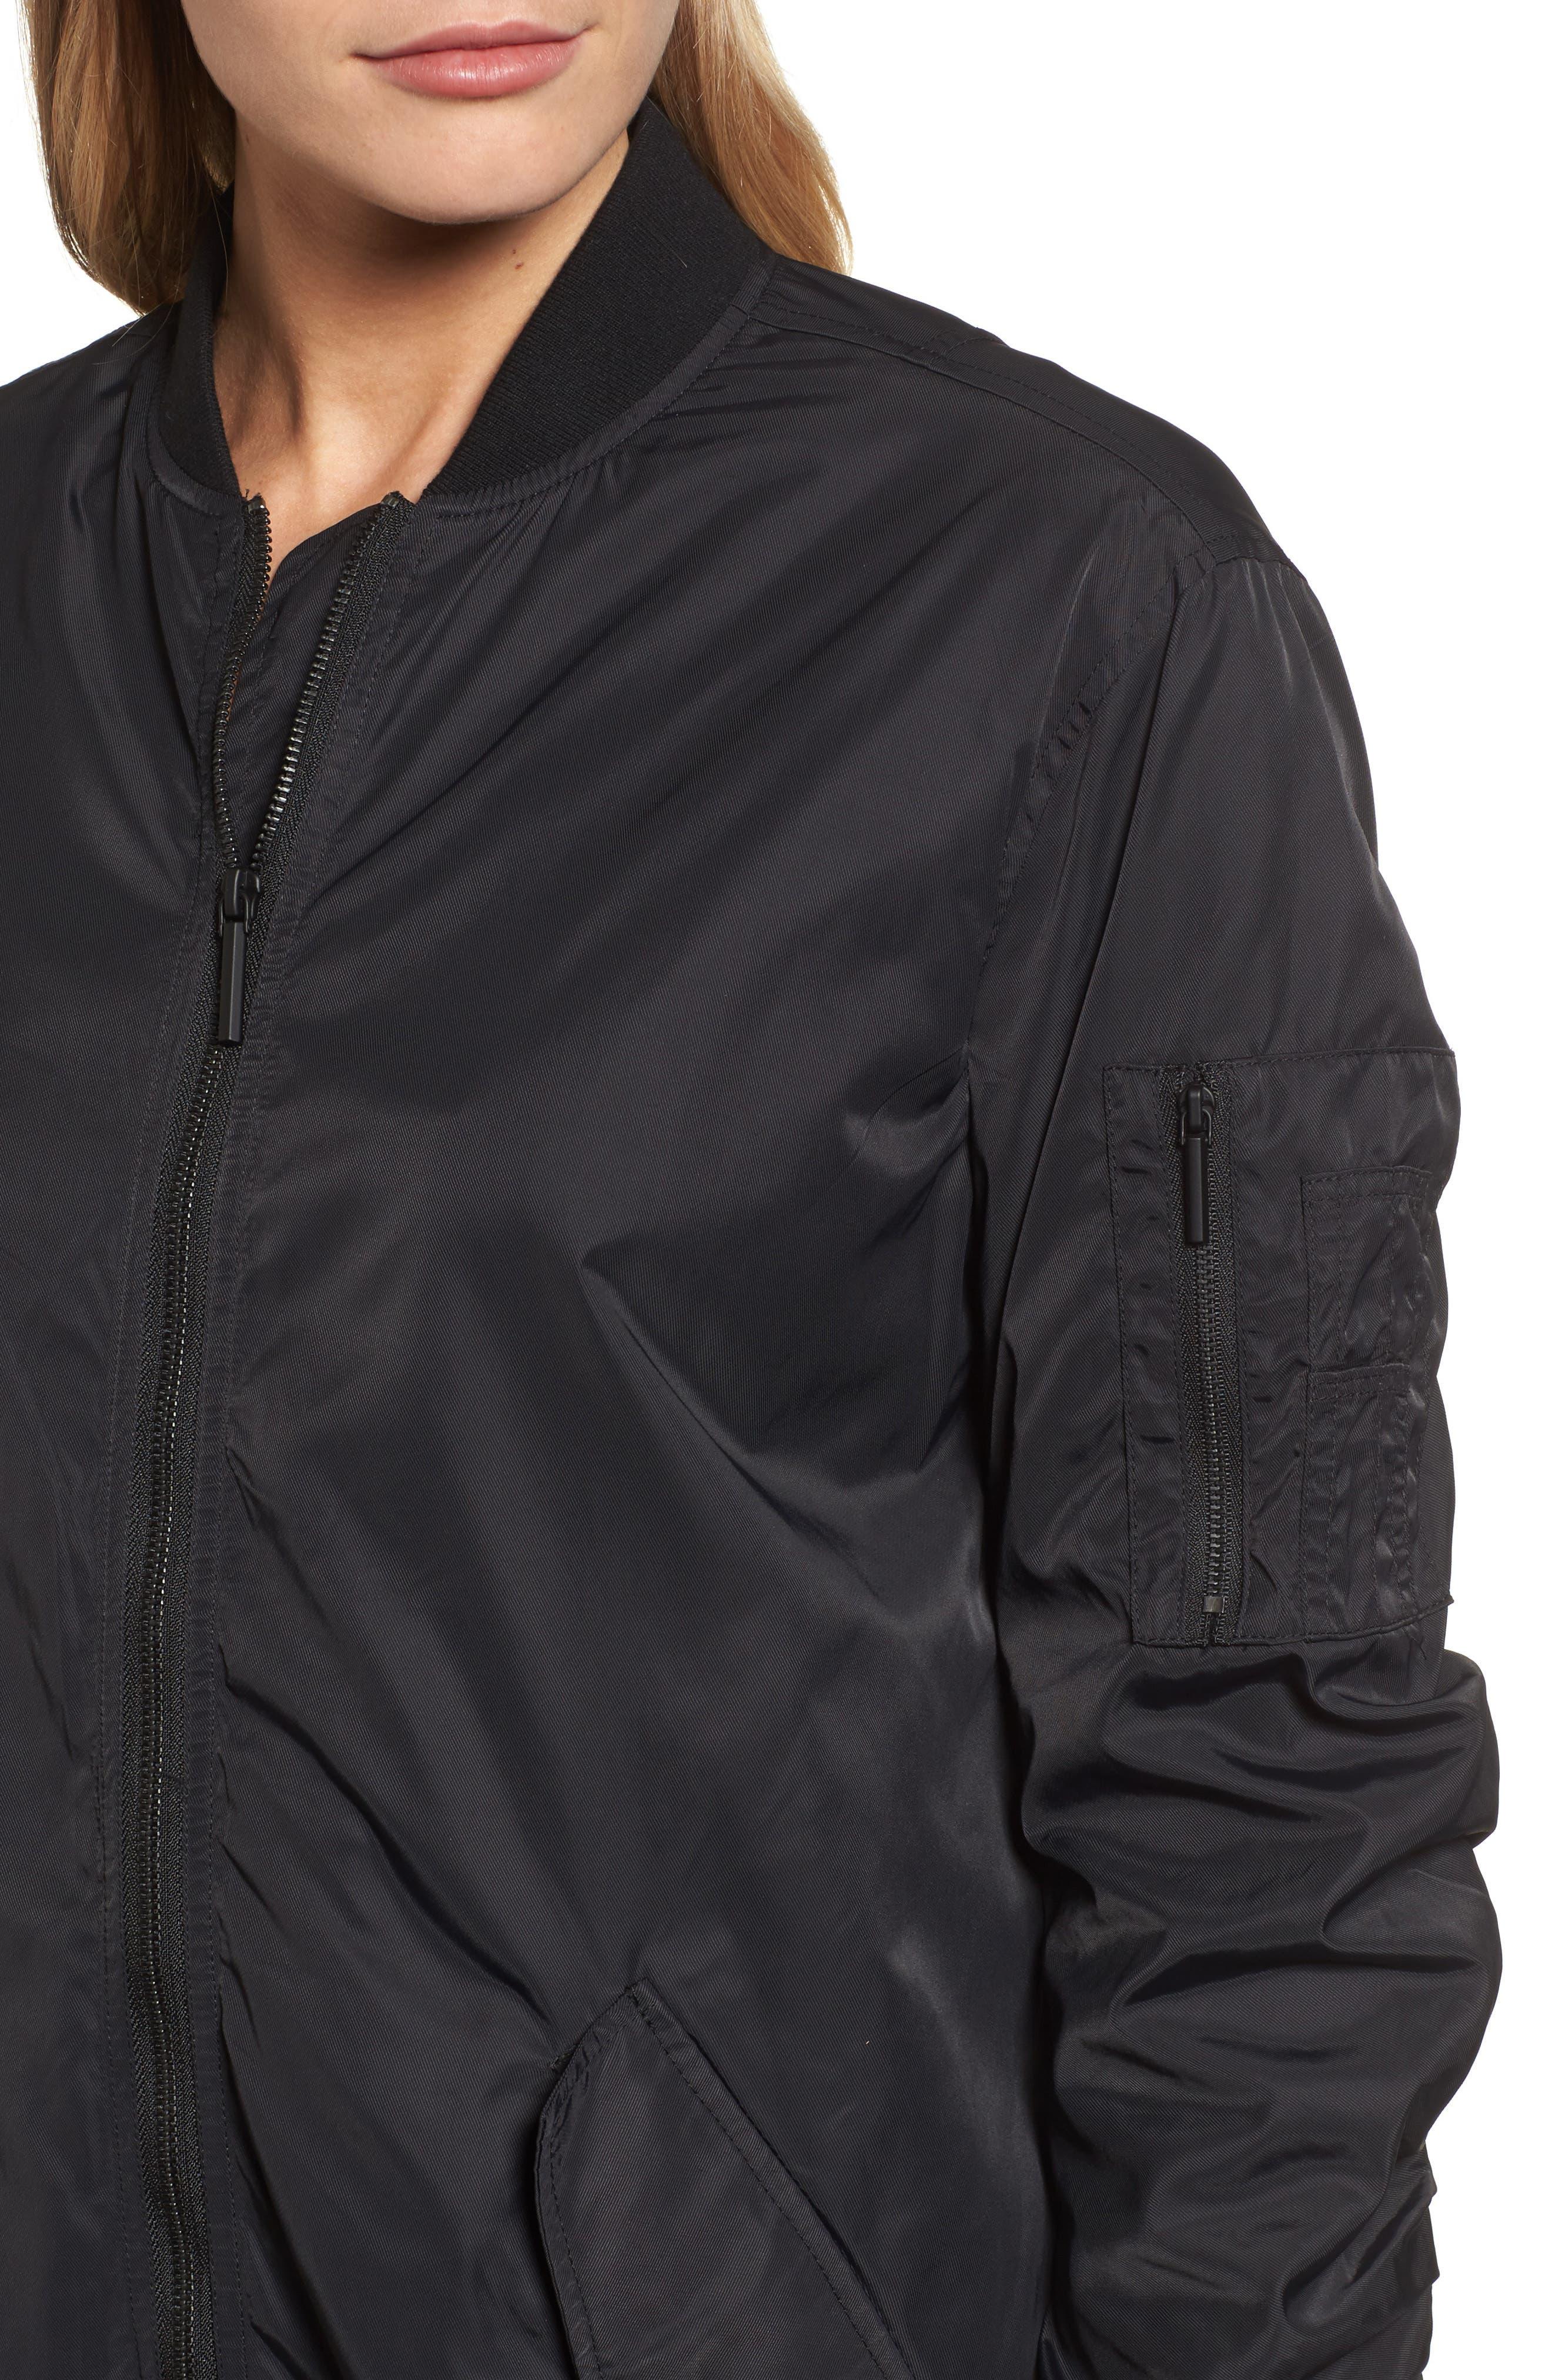 Bomber Anorak Jacket,                             Alternate thumbnail 4, color,                             Black